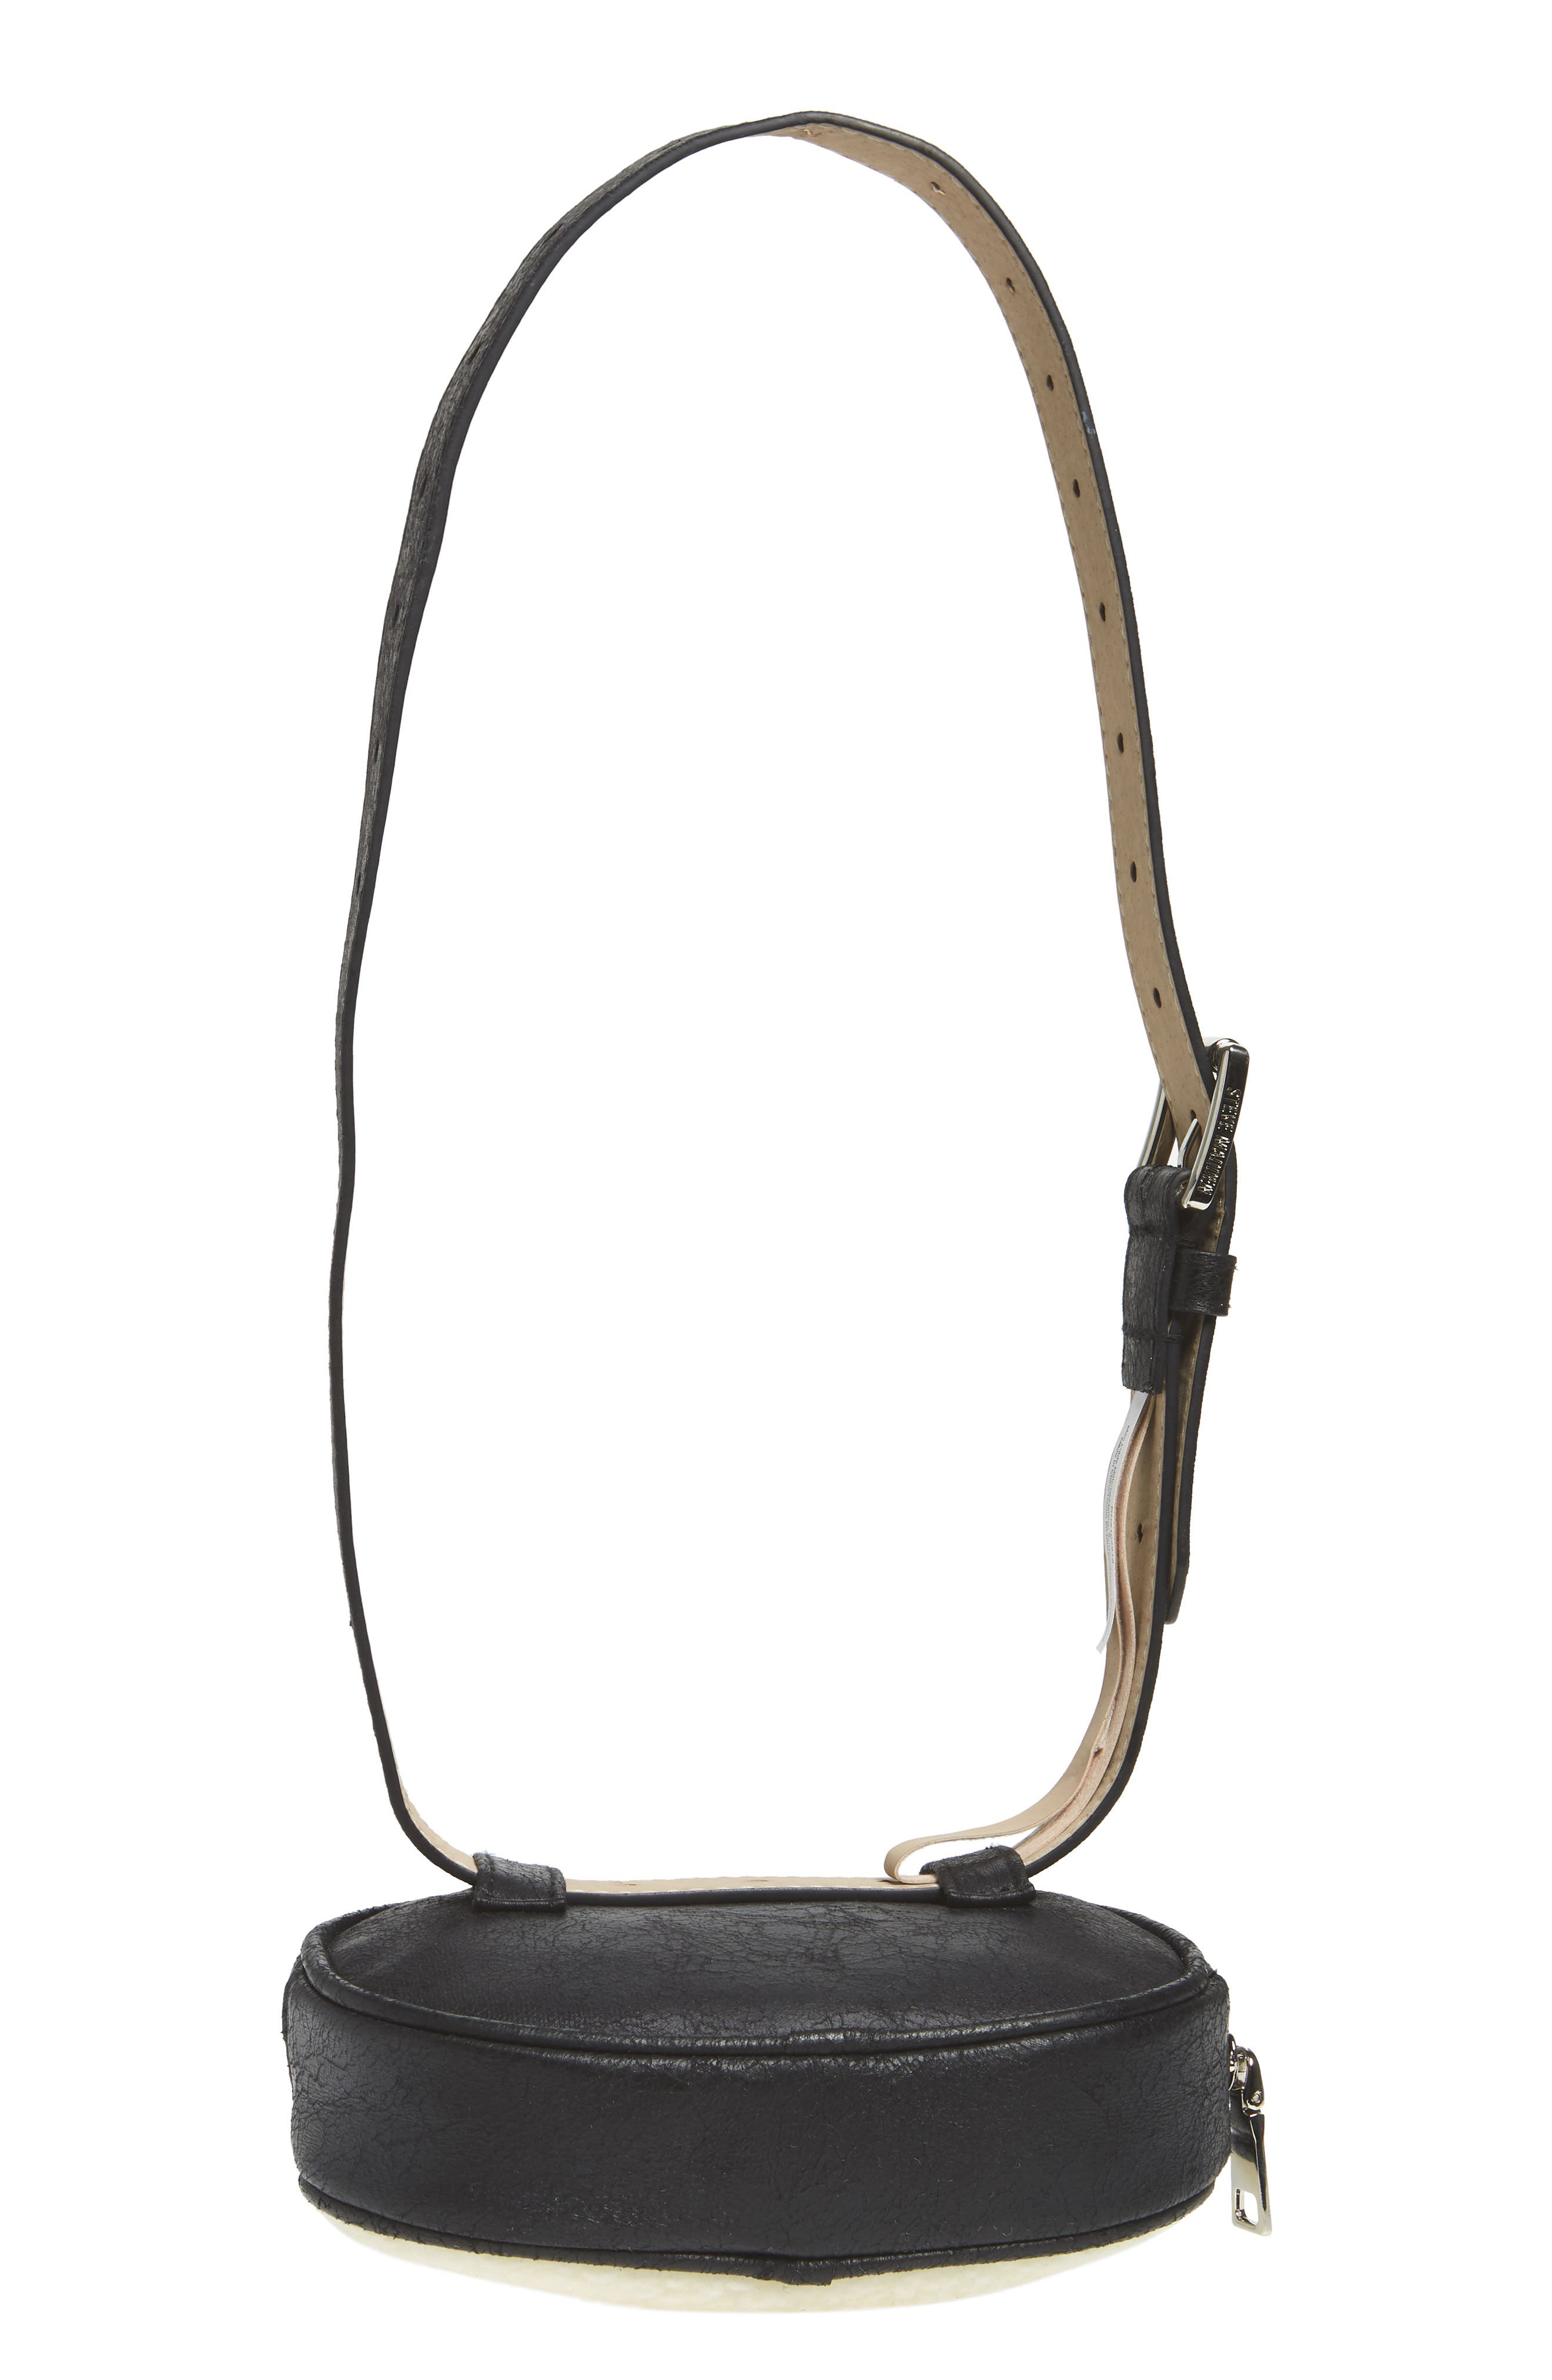 Faux Shearling Belt Bag,                             Alternate thumbnail 7, color,                             BLACK/ NATURAL